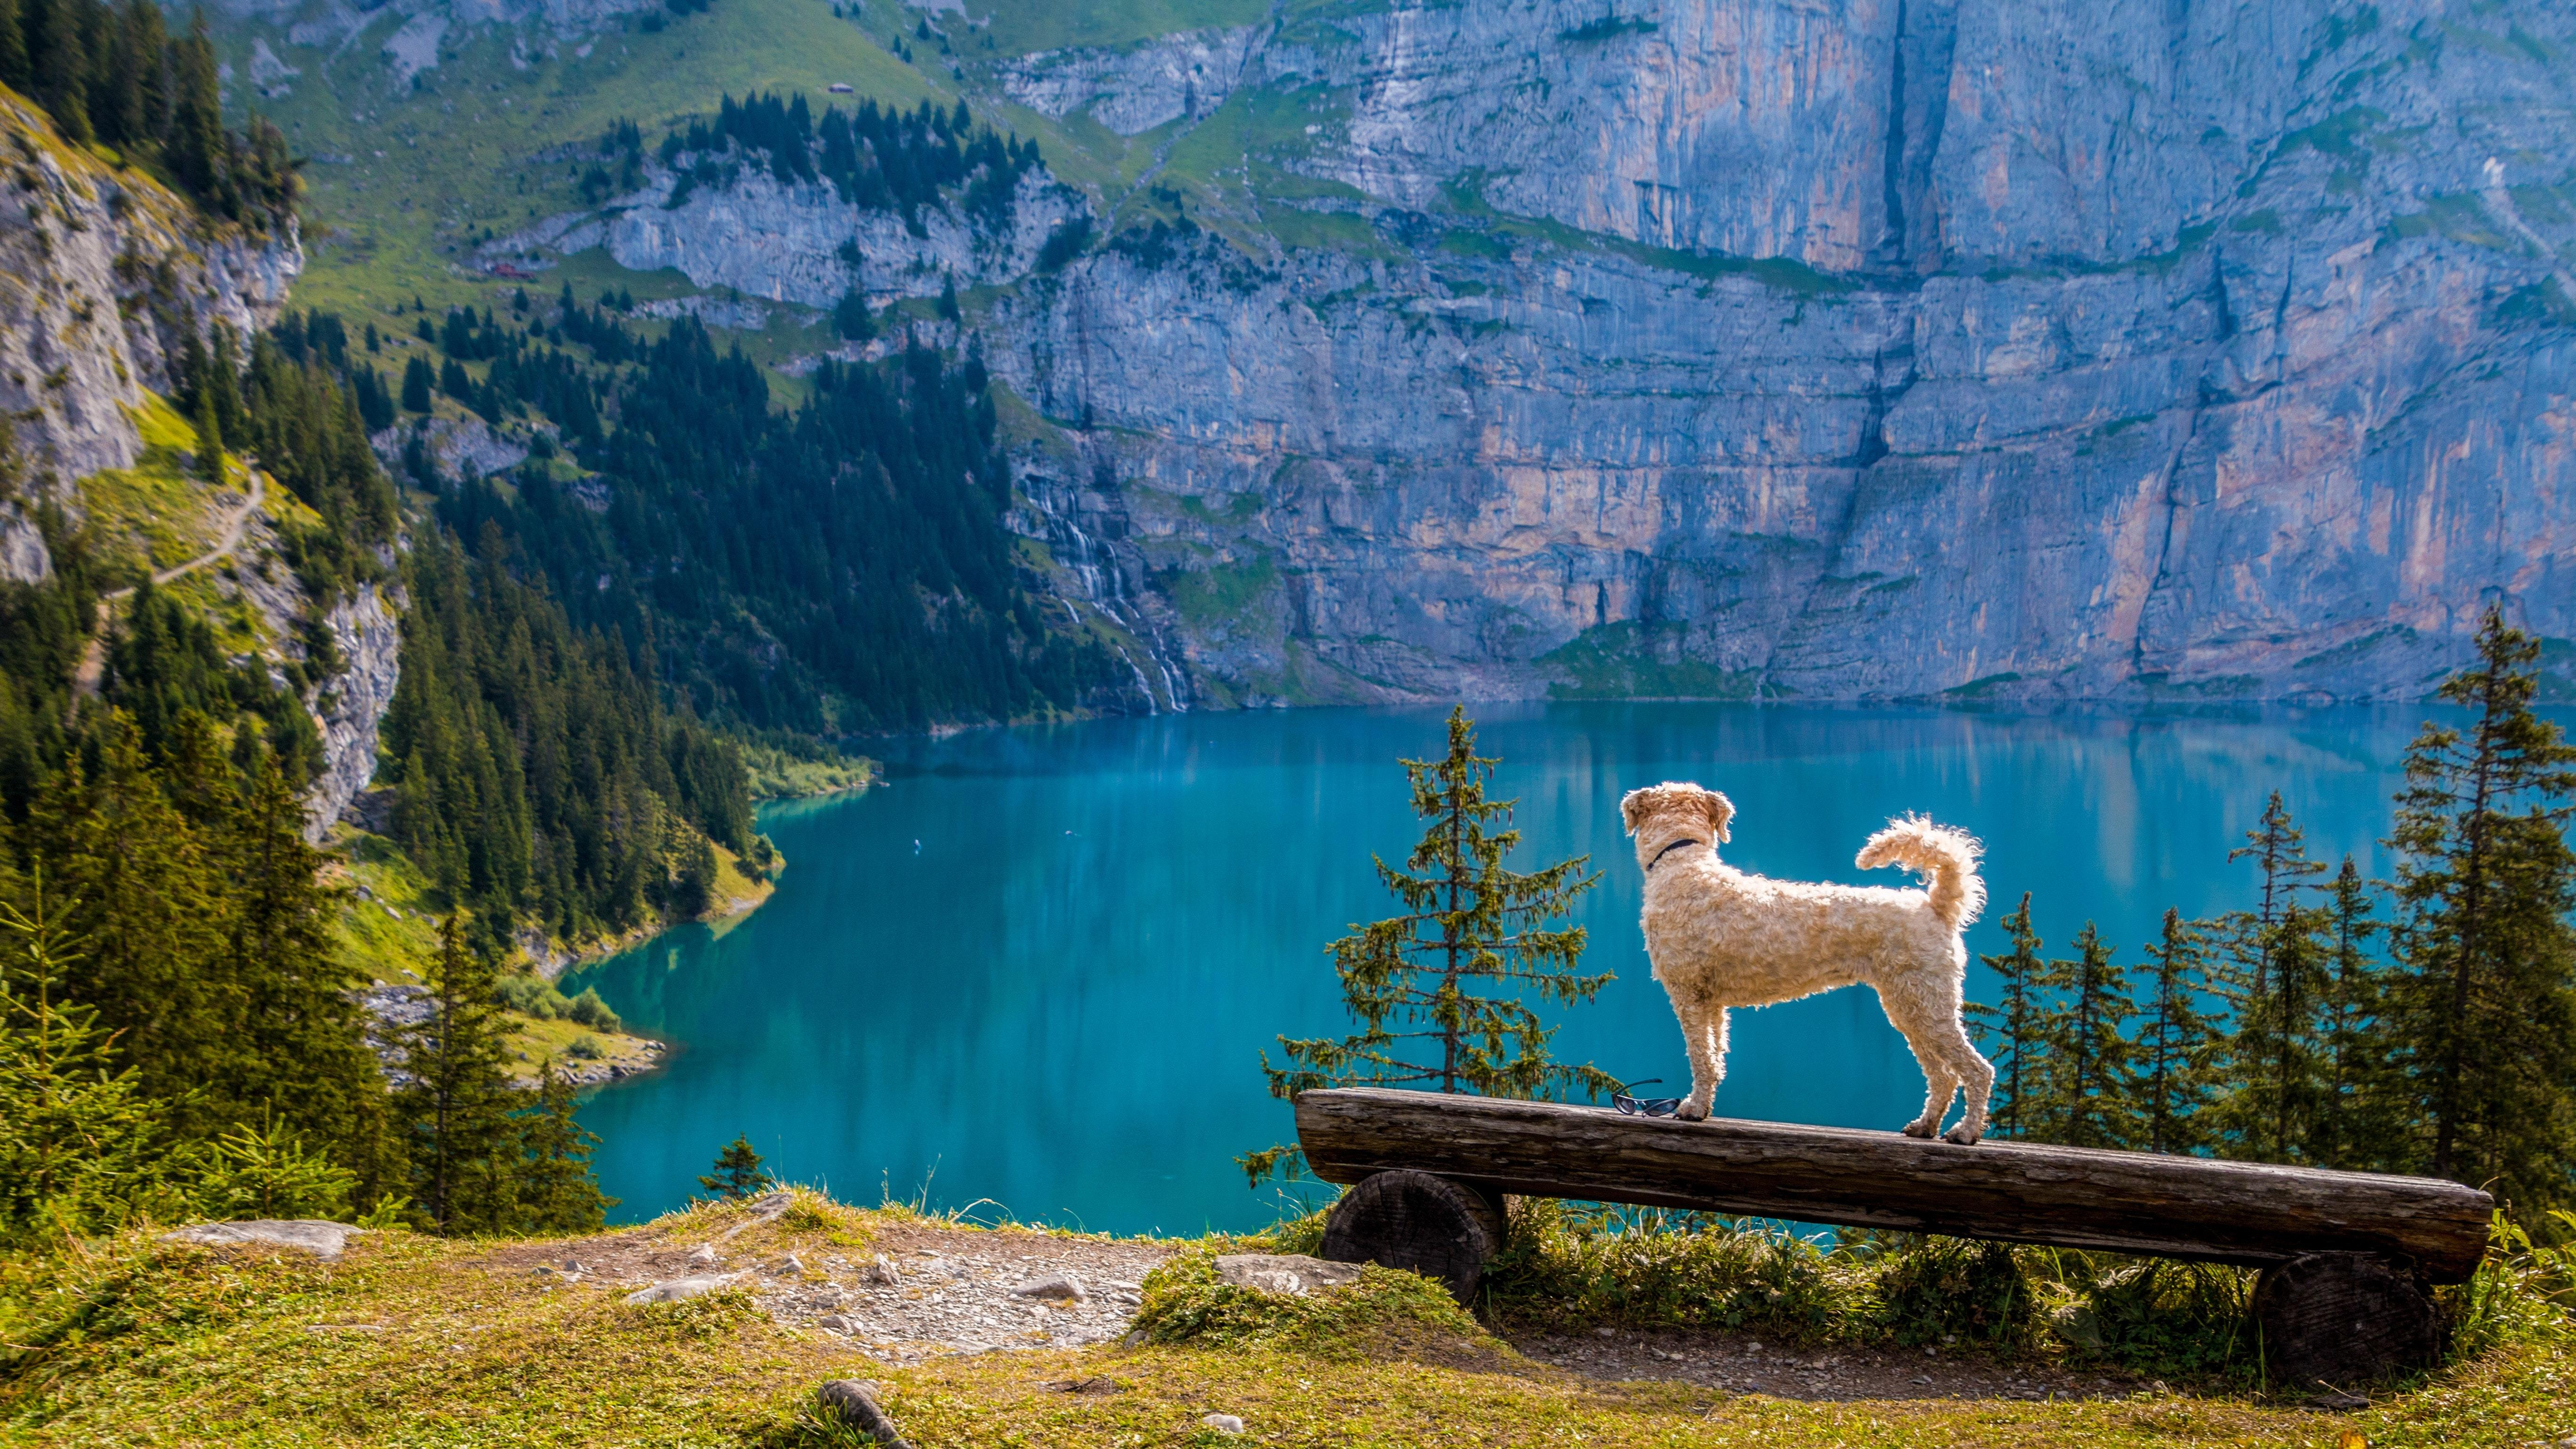 Swan on Lake Against Mountain